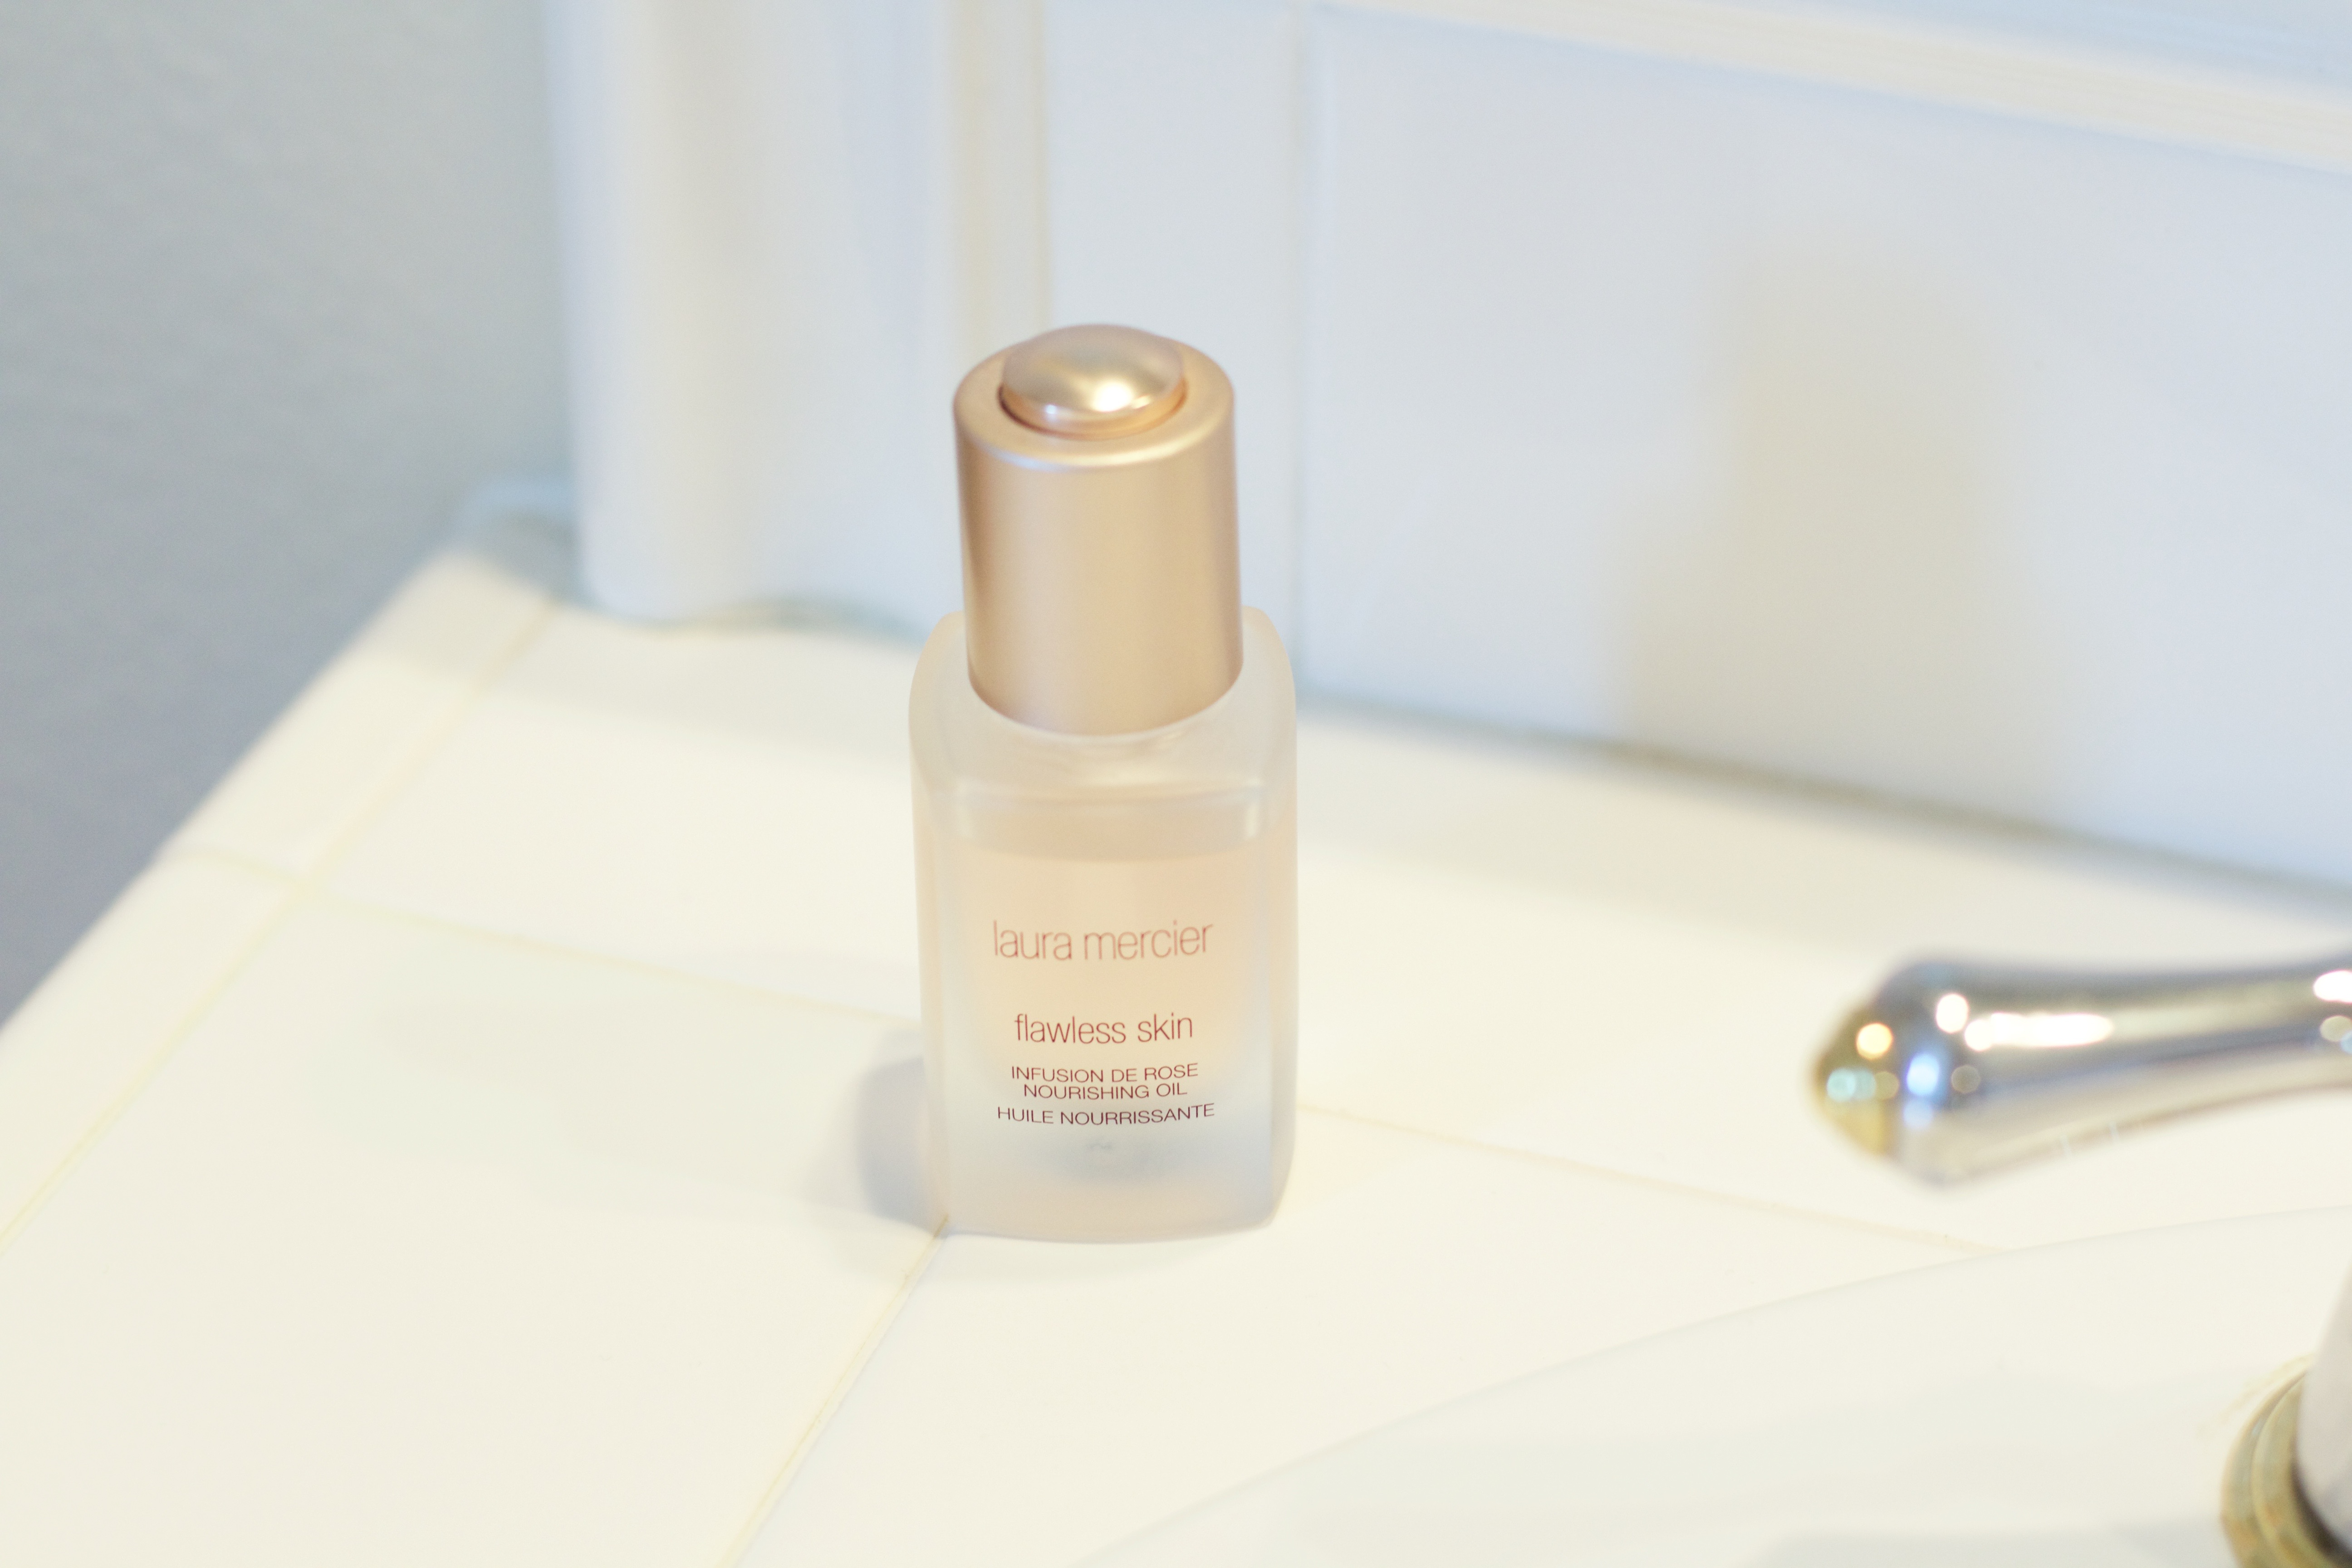 Laura Mercier Flawless Skin Infusion de Rose Nourishing Oil